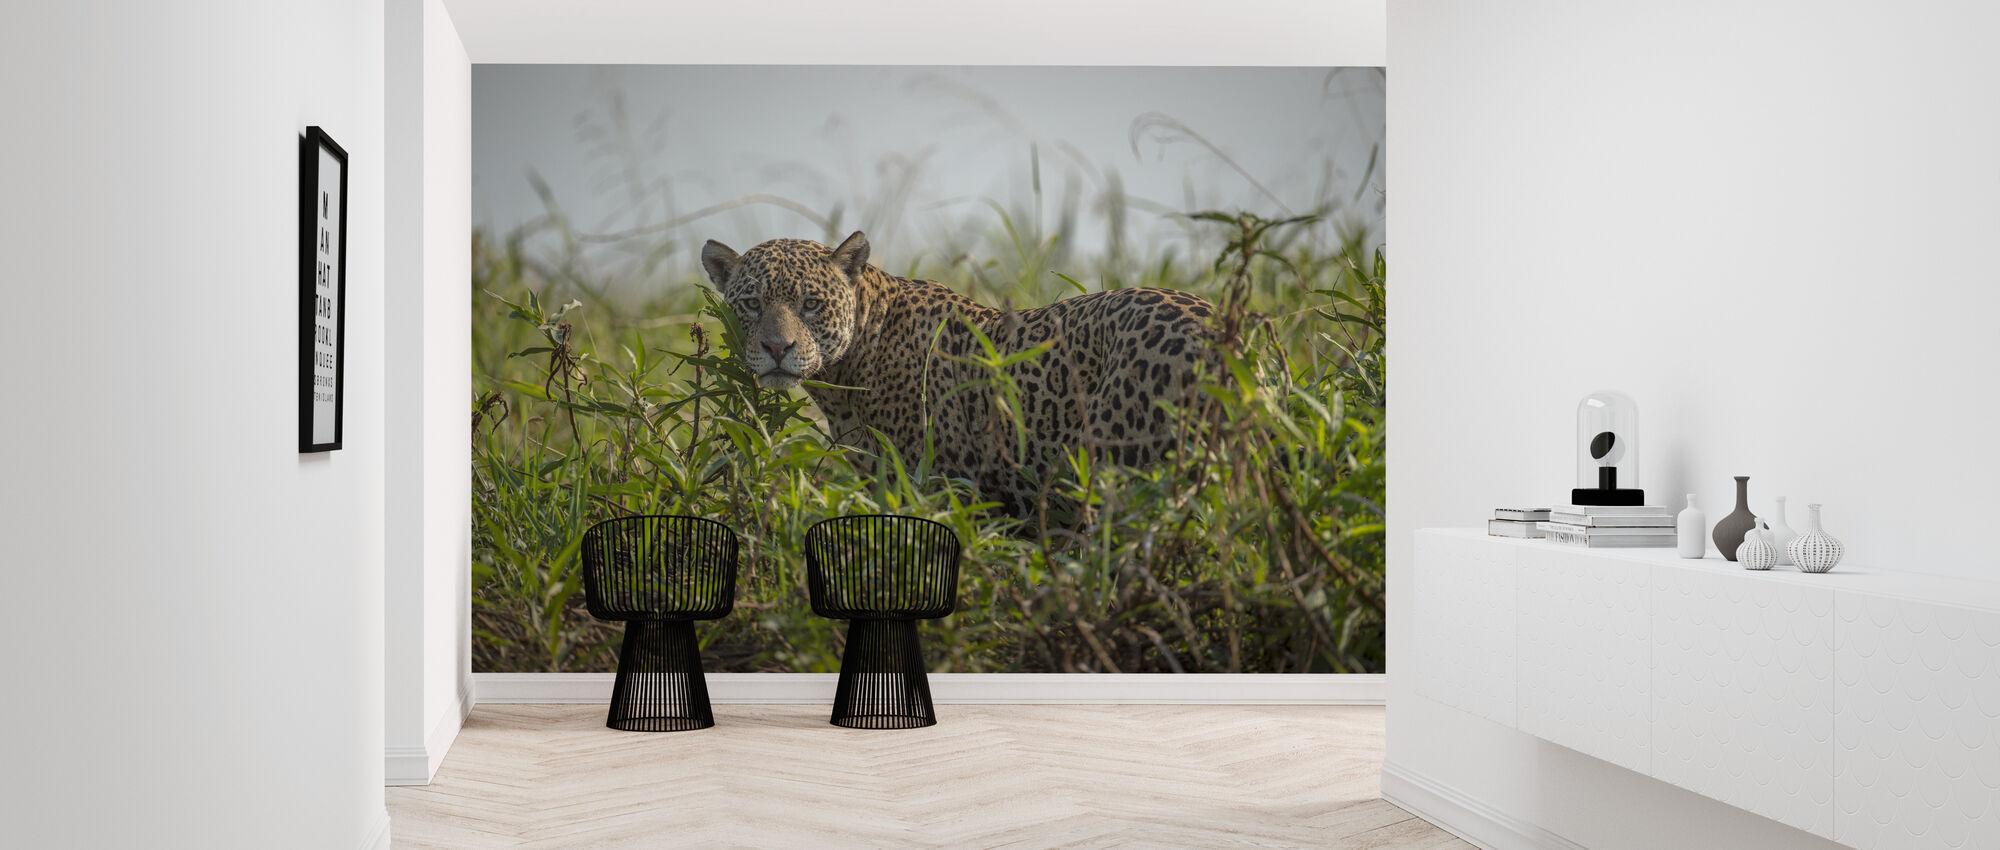 Male Jaguar - Wallpaper - Hallway